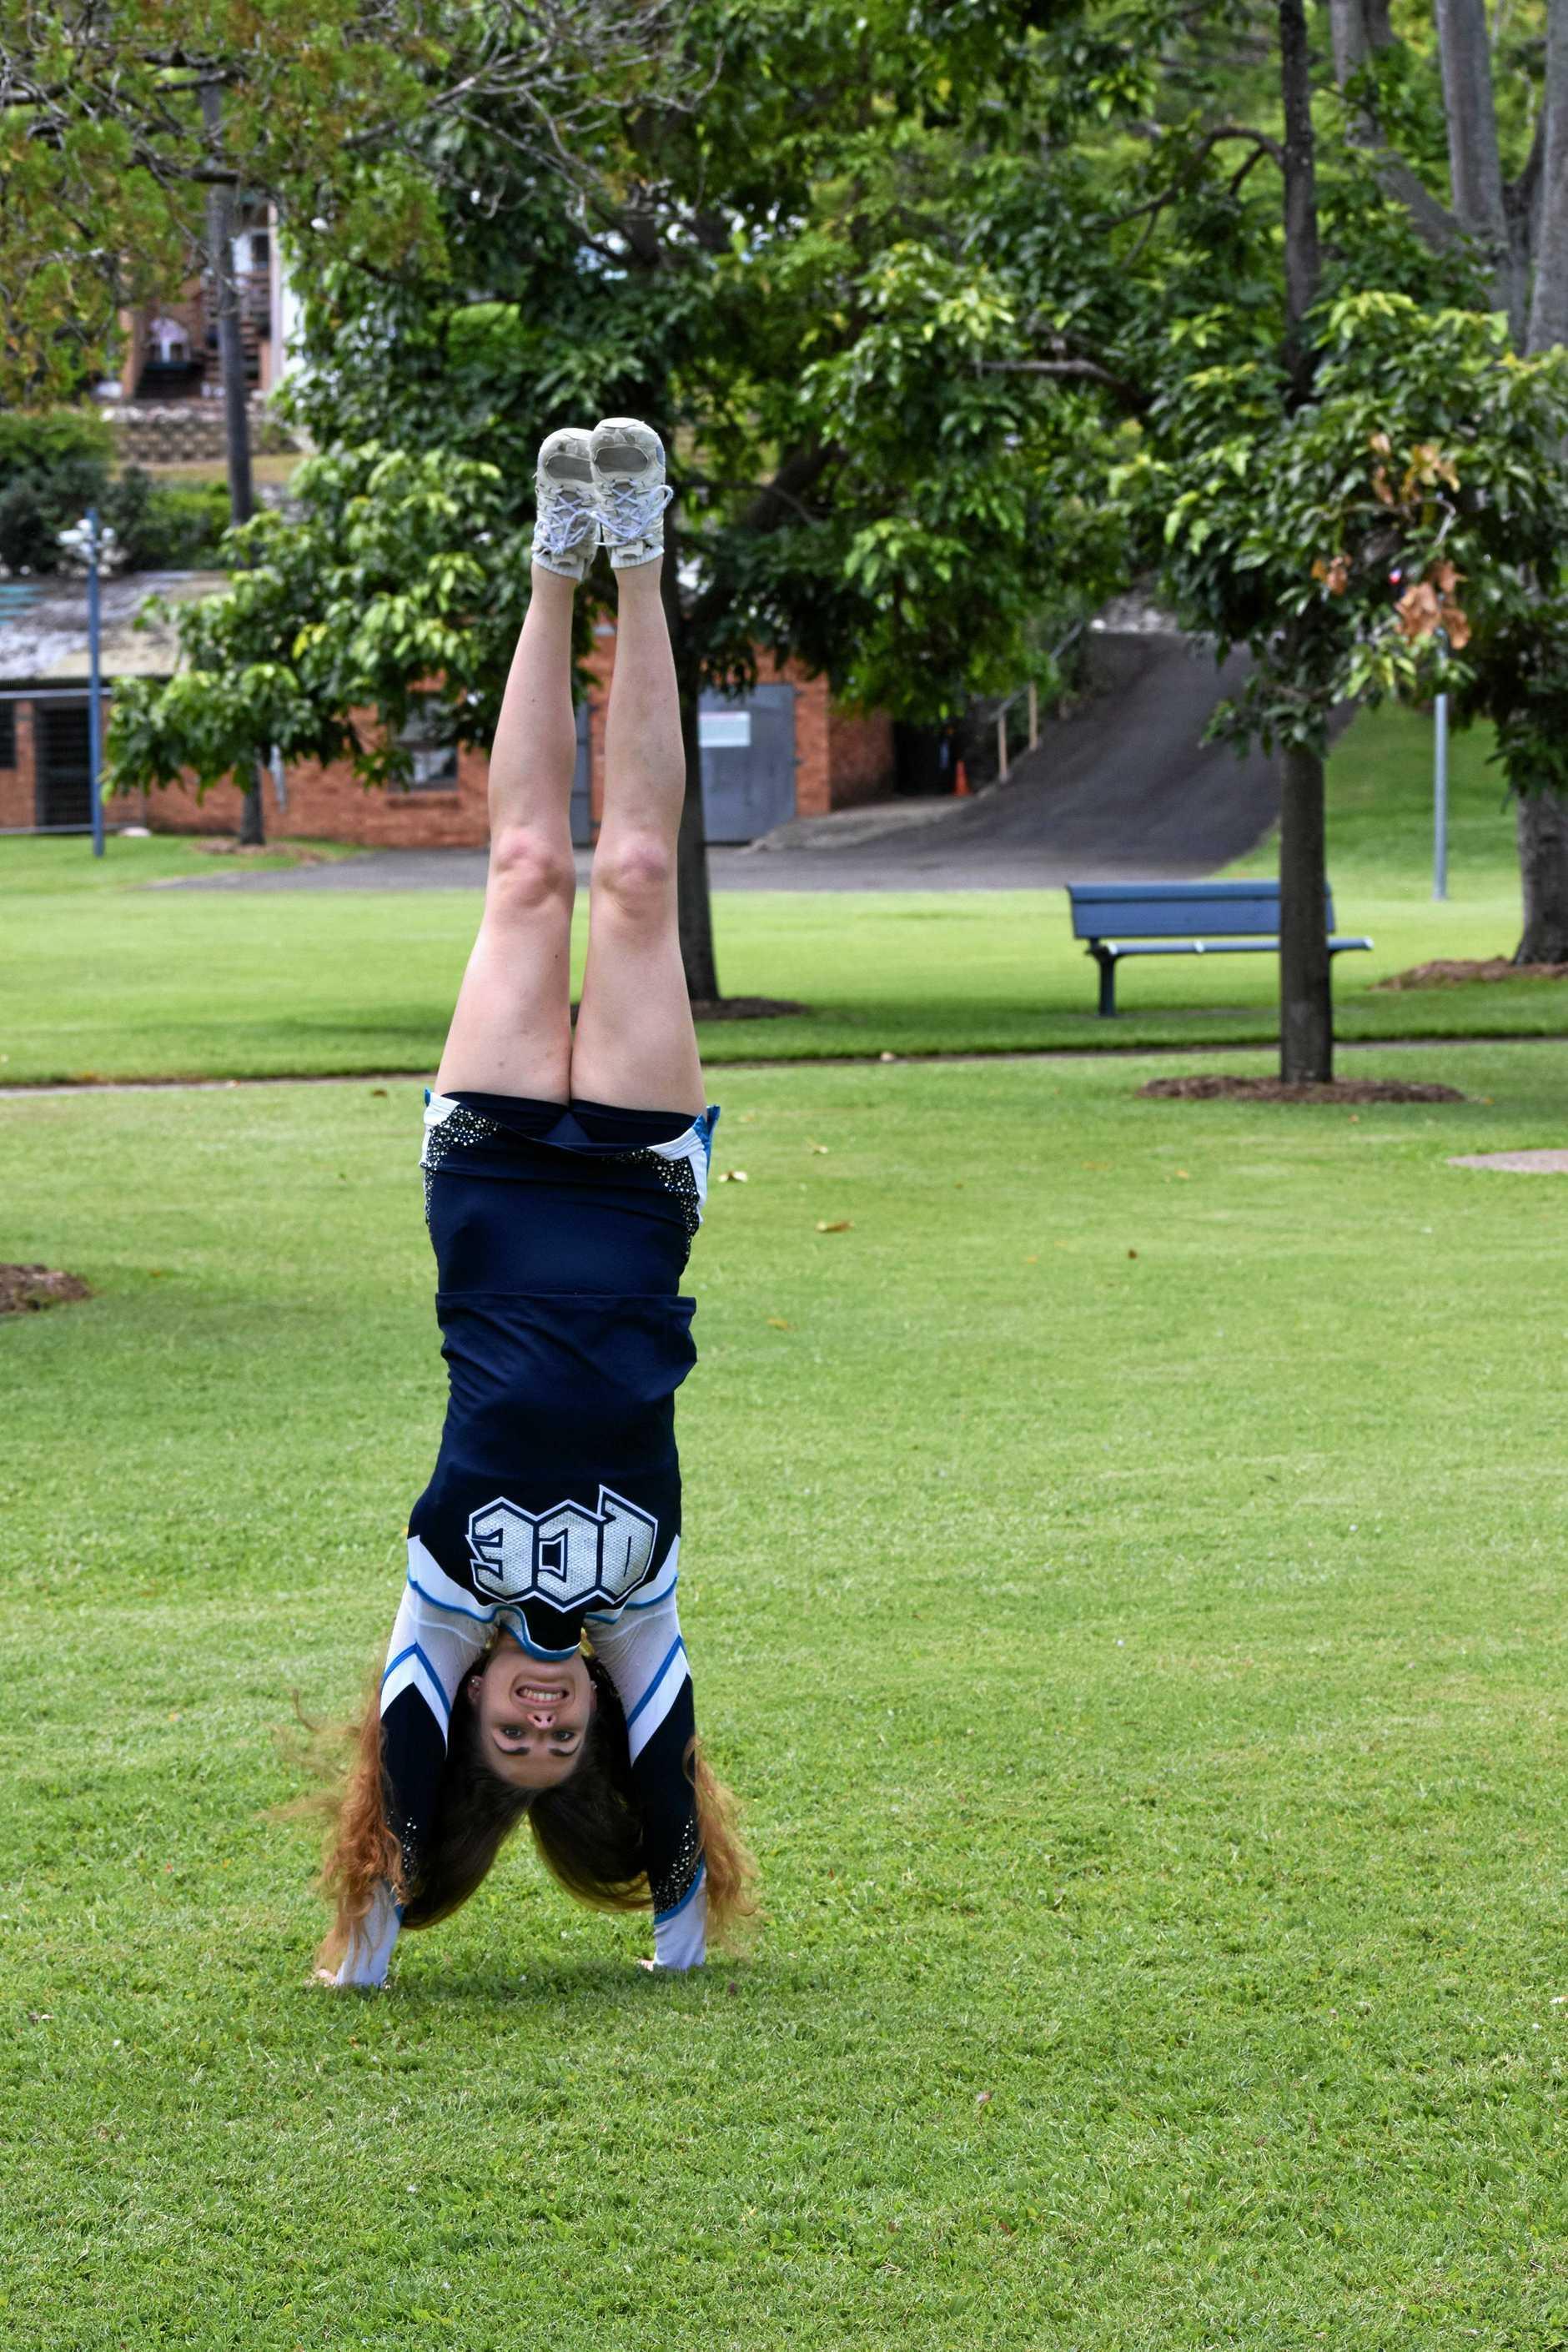 Gympie cheerleader - Eliza Parker